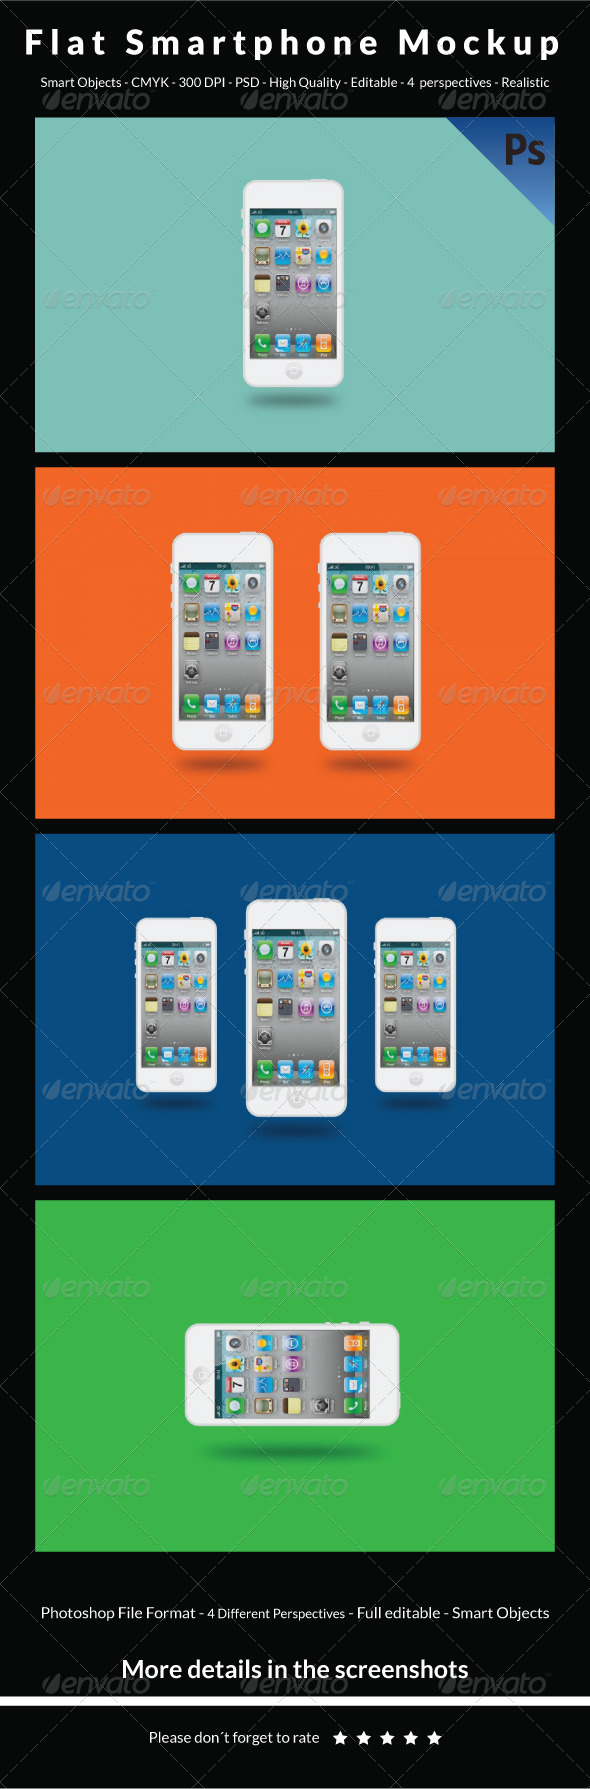 Flat Smartphone Mockup